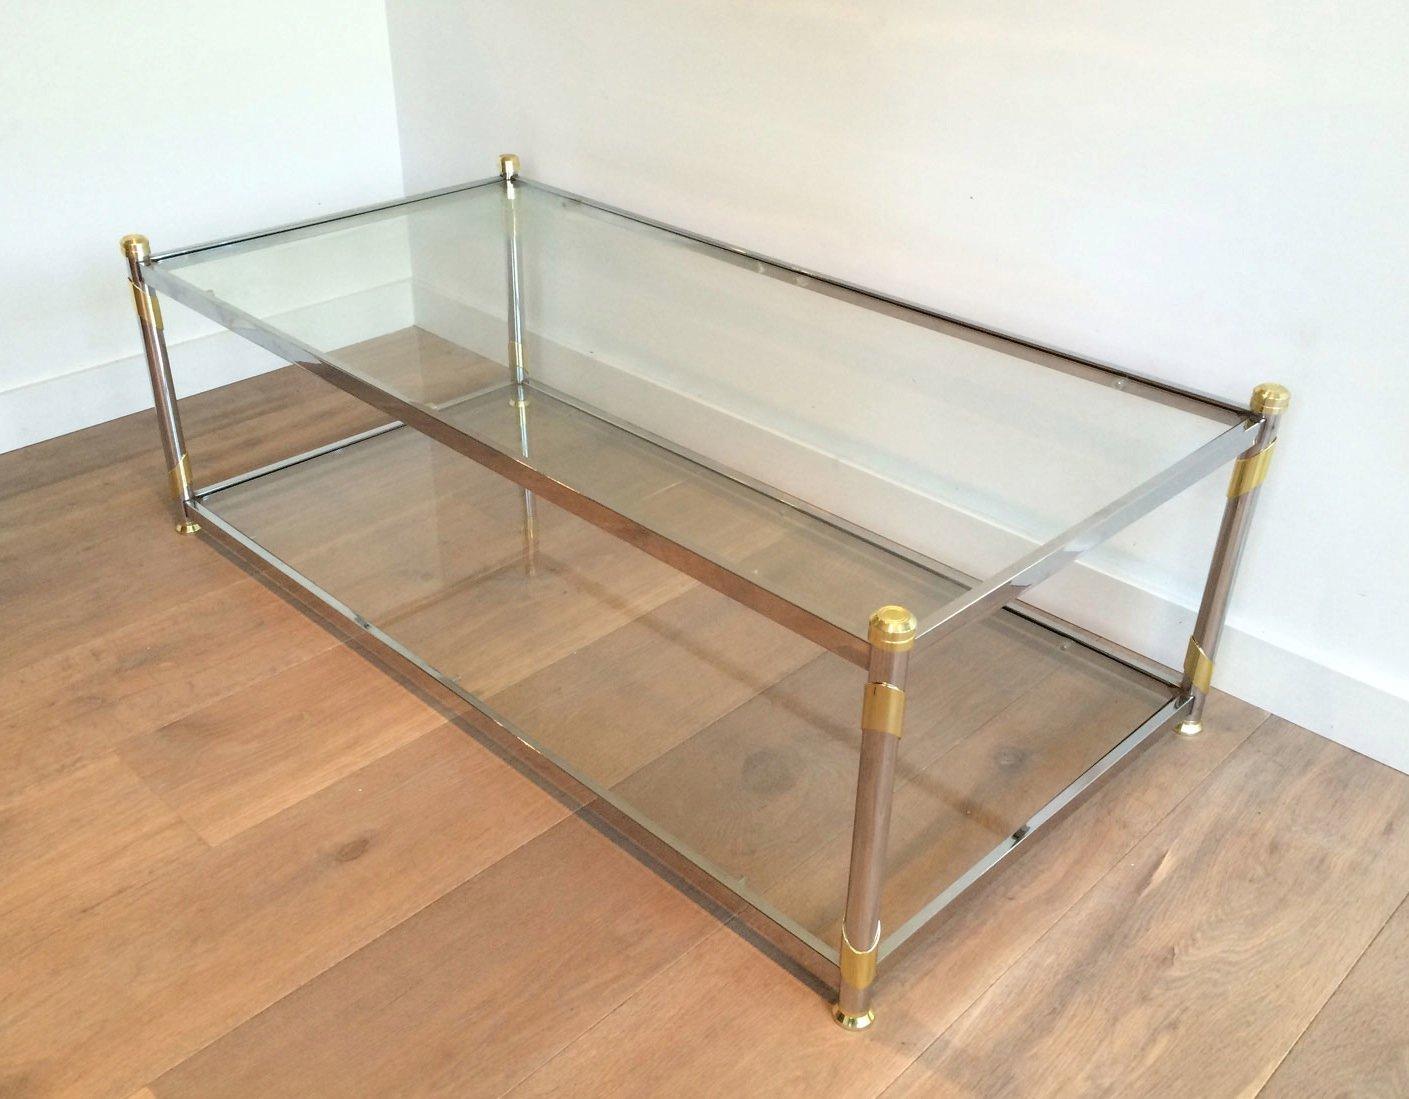 couchtisch aus chrom vergoldetem metall 1970er bei. Black Bedroom Furniture Sets. Home Design Ideas